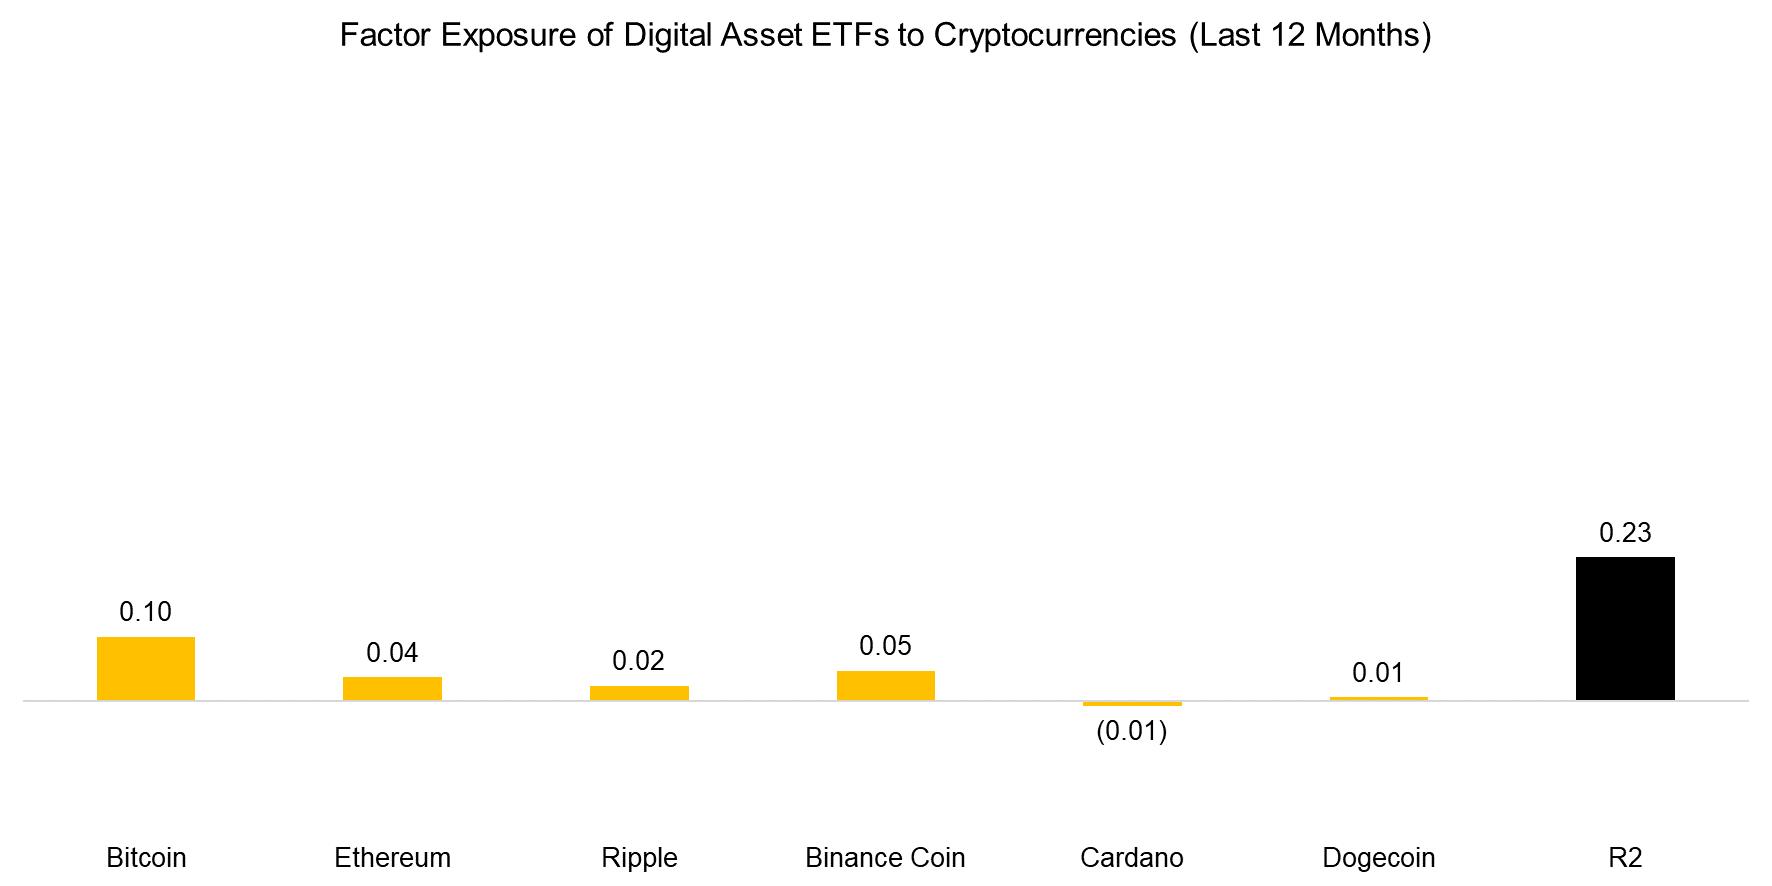 Factor Exposure of Digital Asset ETFs to Cryptocurrencies (Last 12 Months)